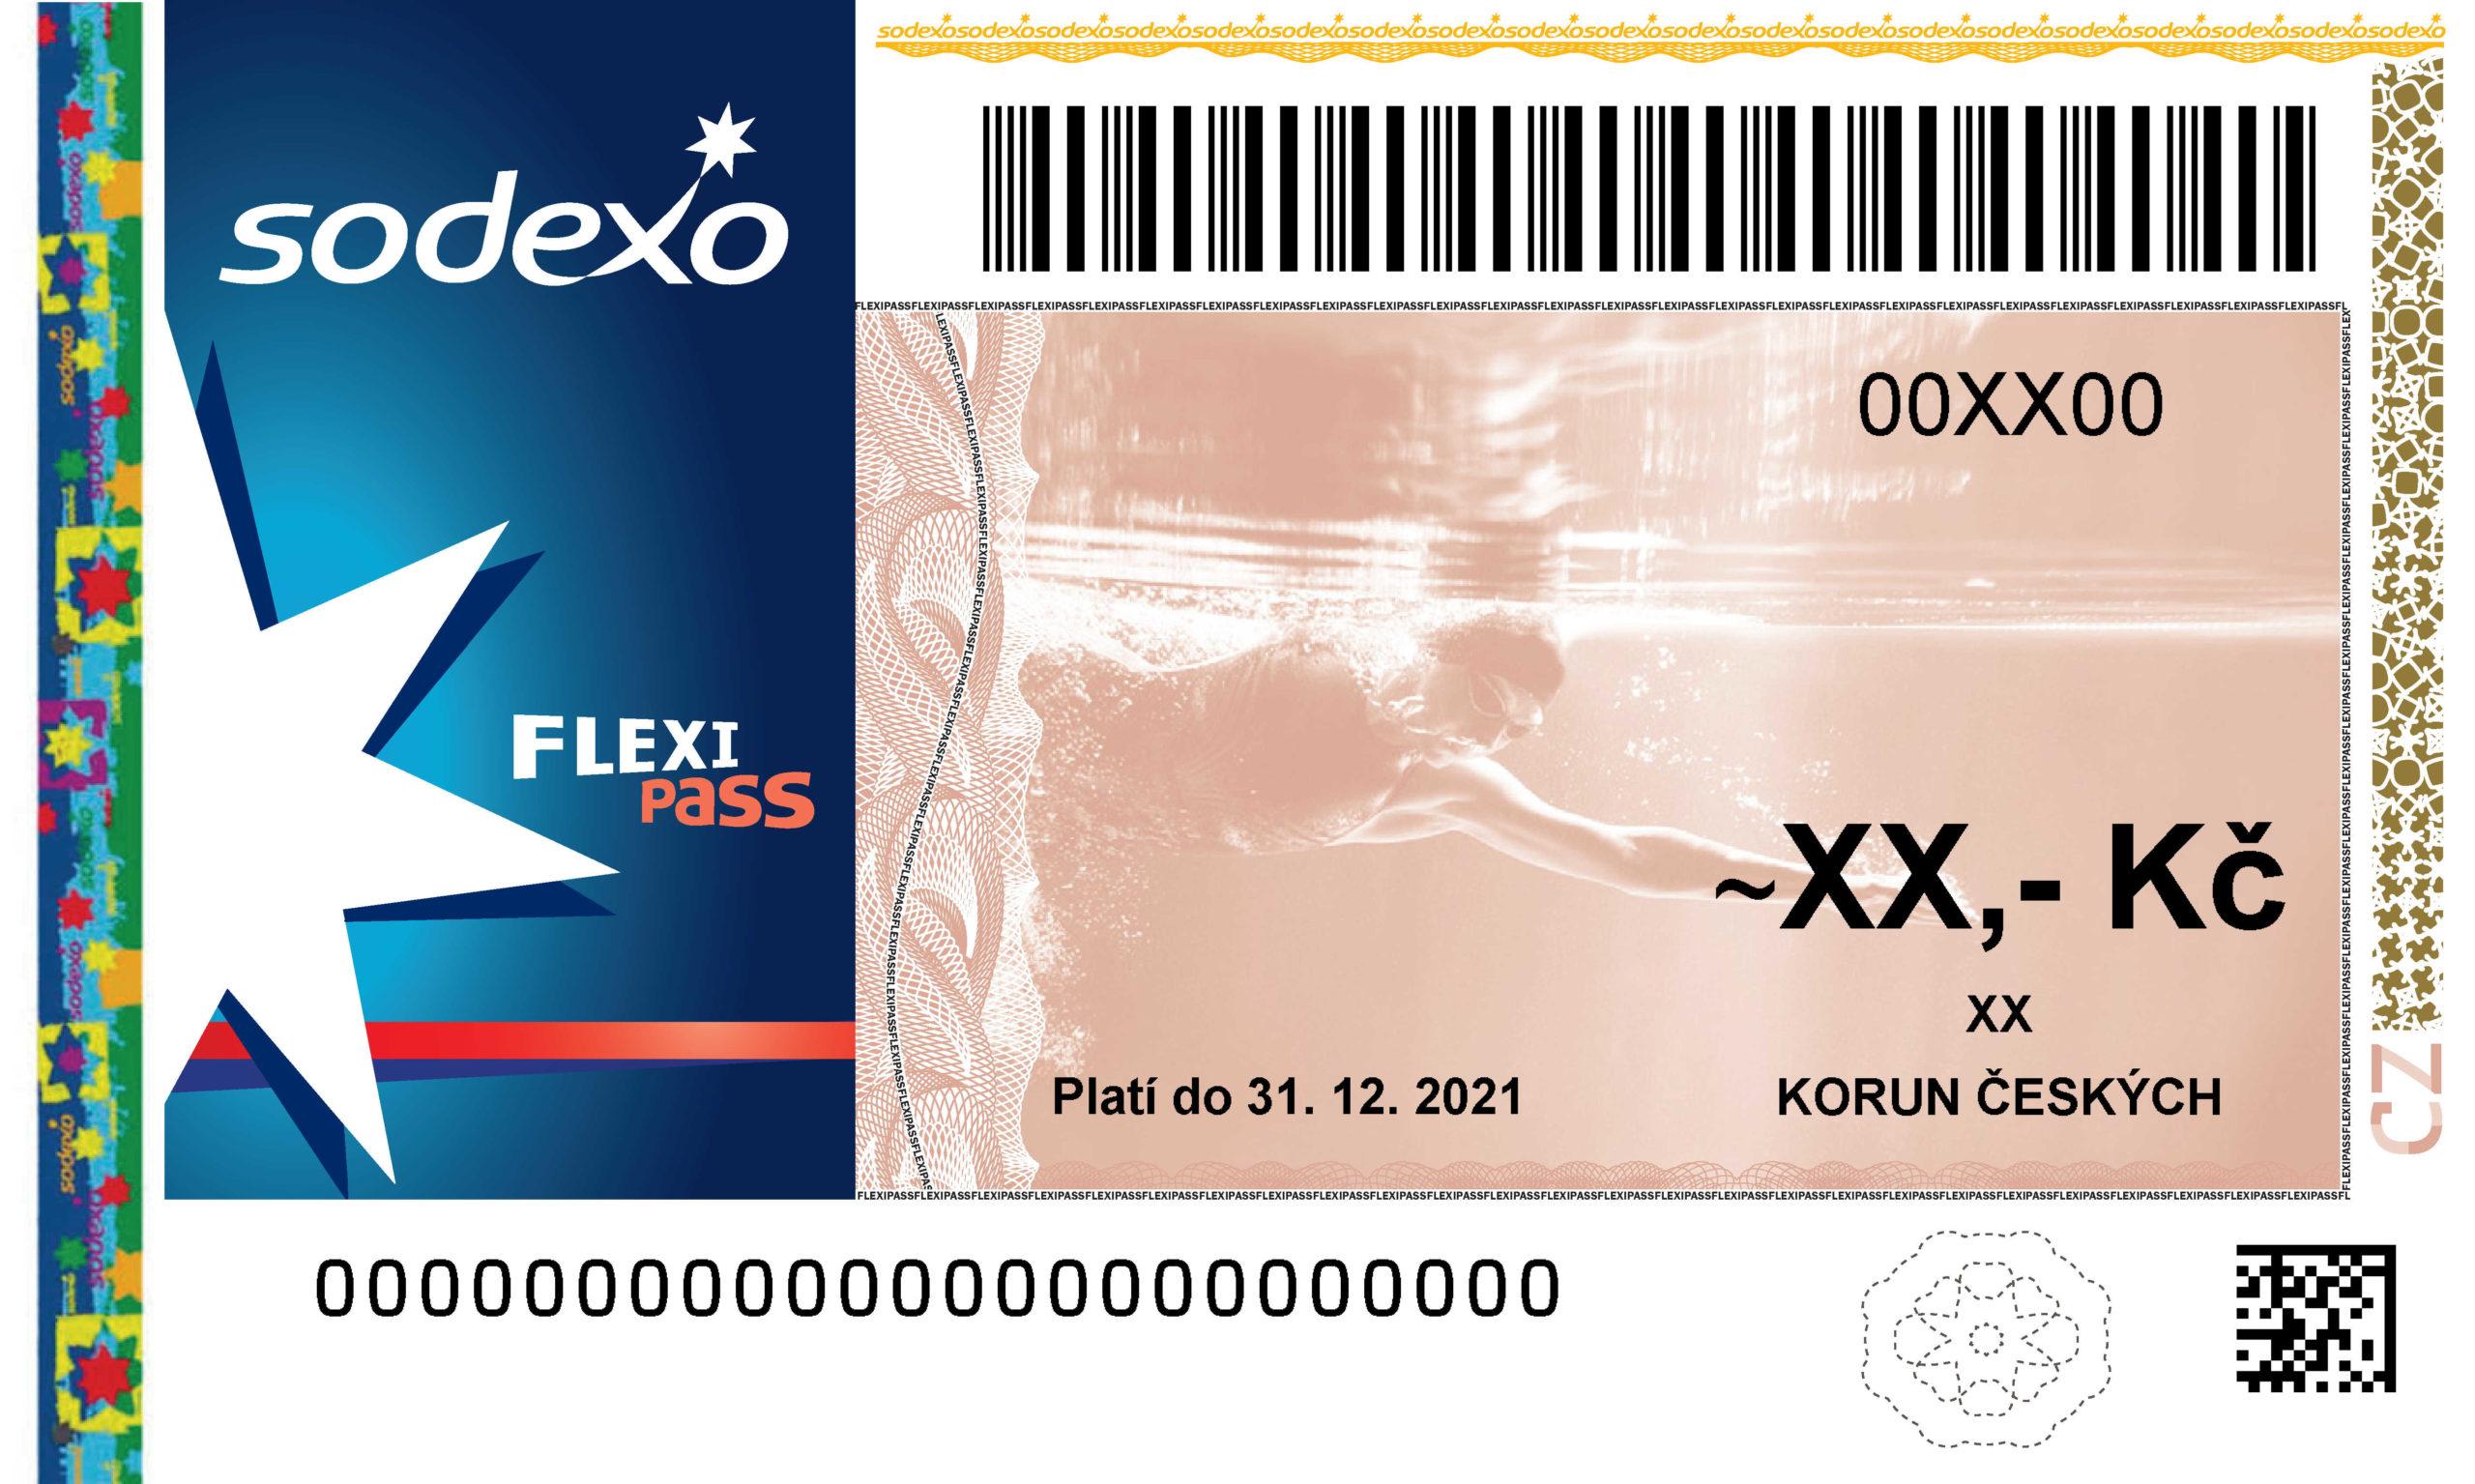 Flexi Pass 2020